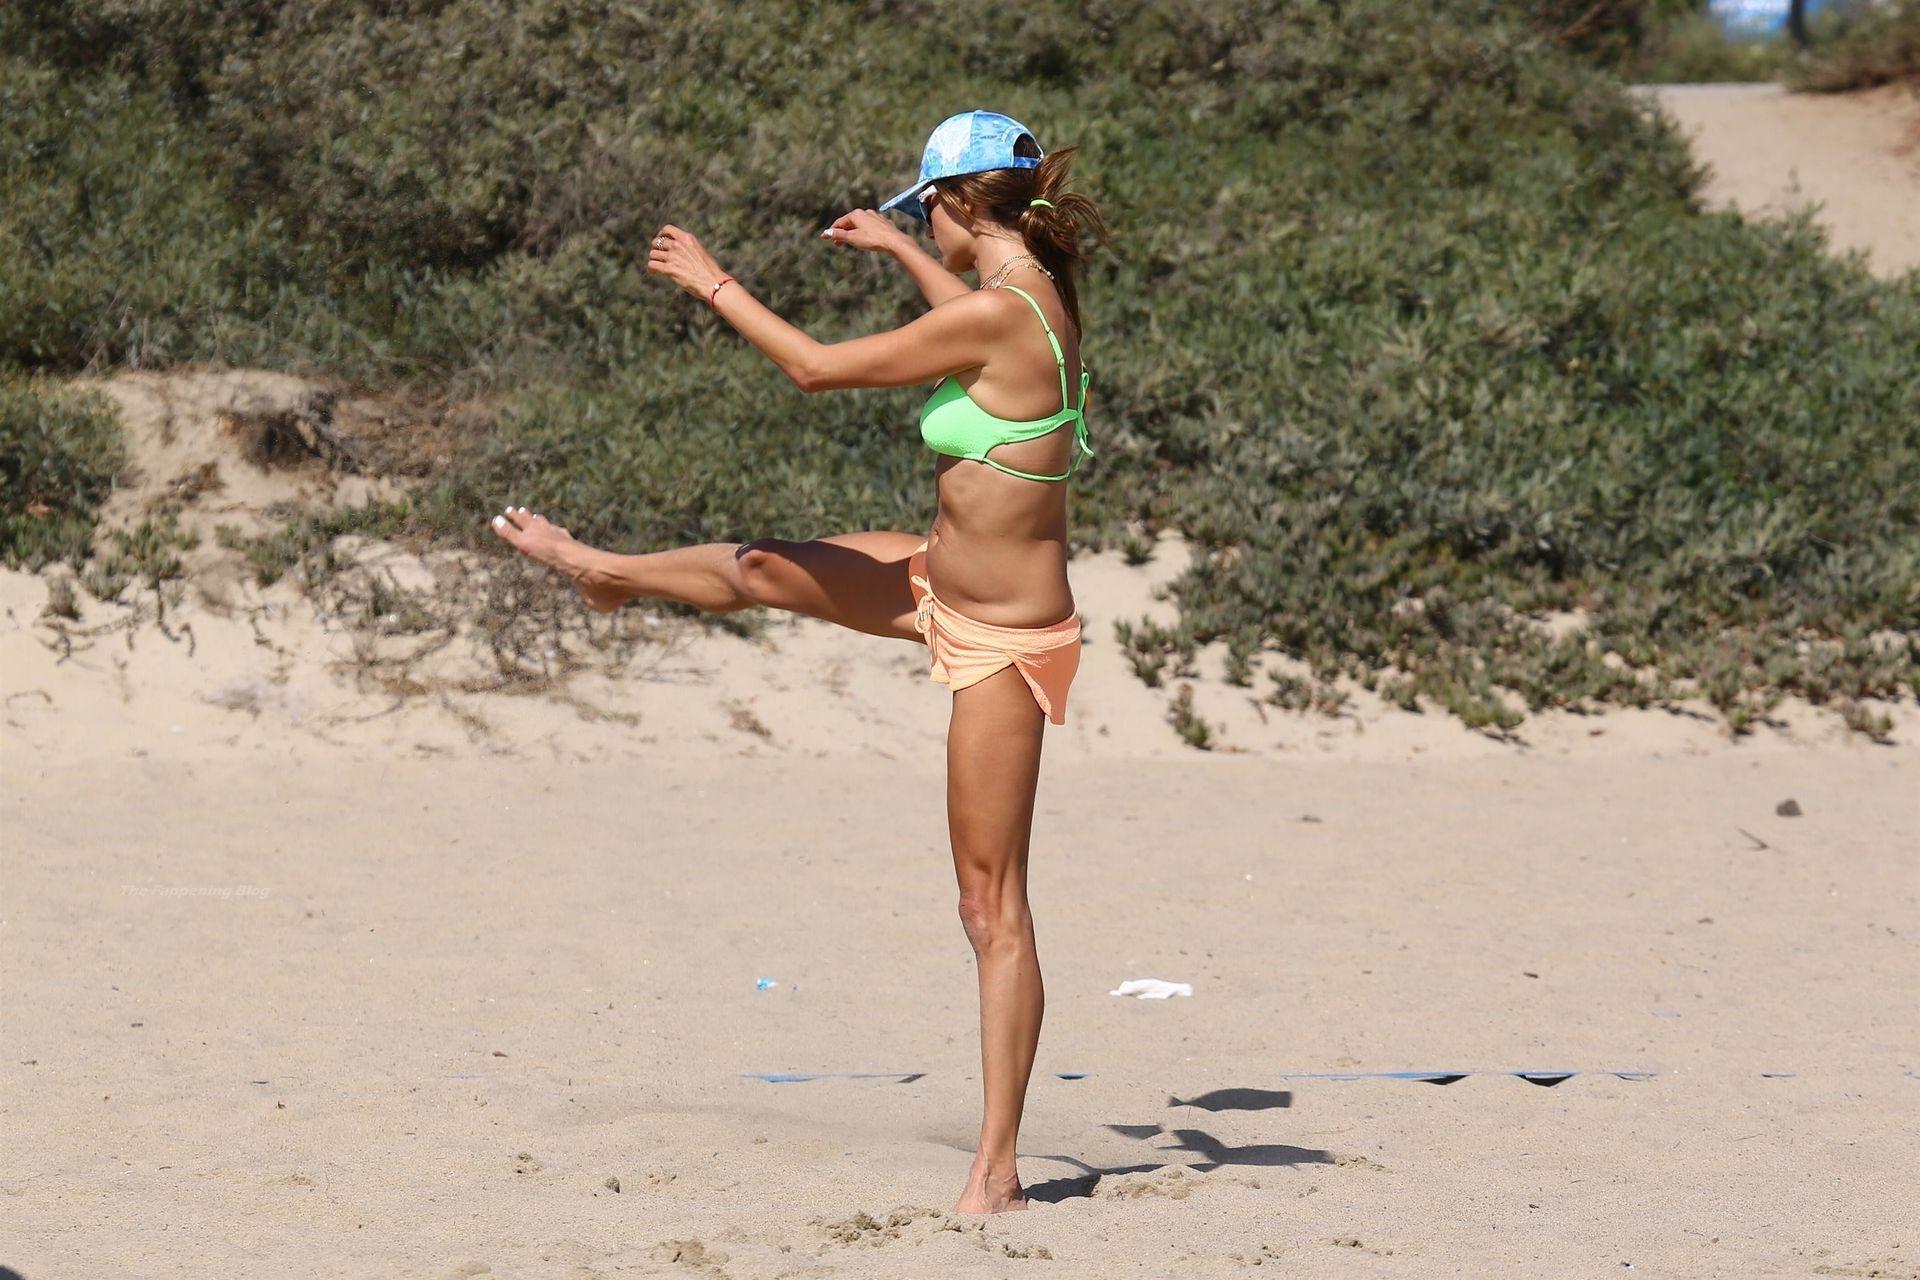 Alessandra-Ambrosio-Sexy-The-Fappening-Blog-231.jpg